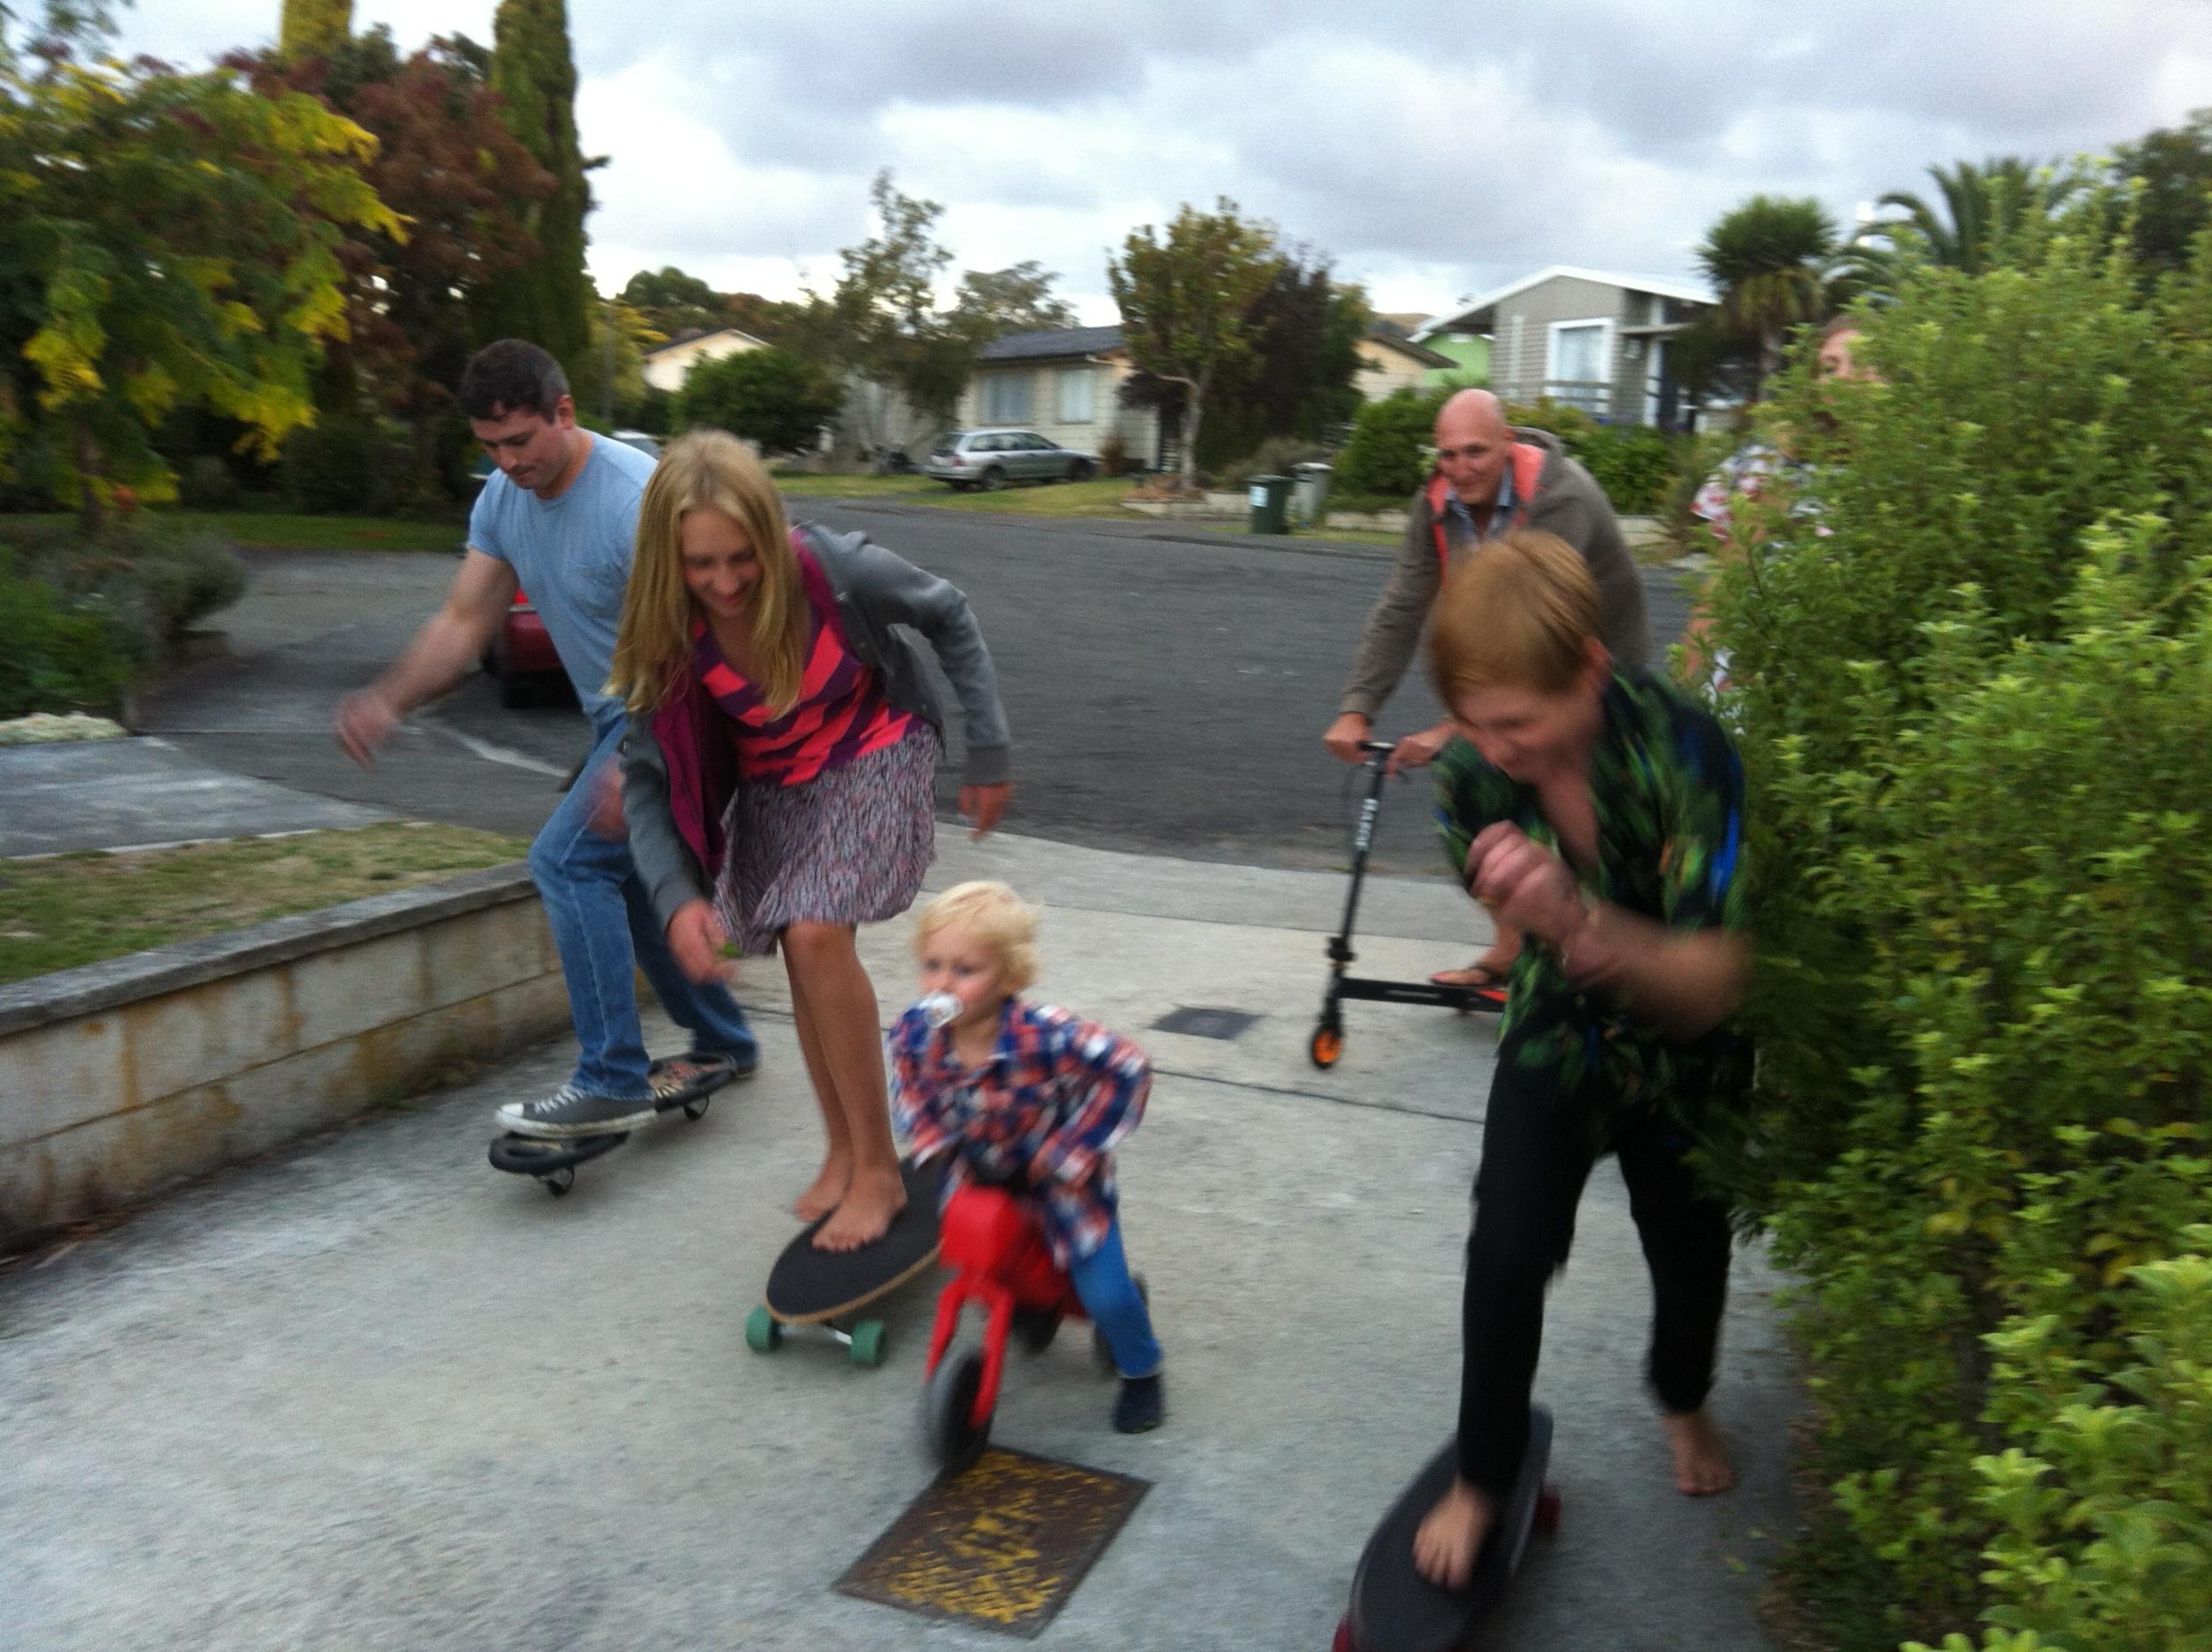 Joe racing the kids on skateboards at the BBQ.